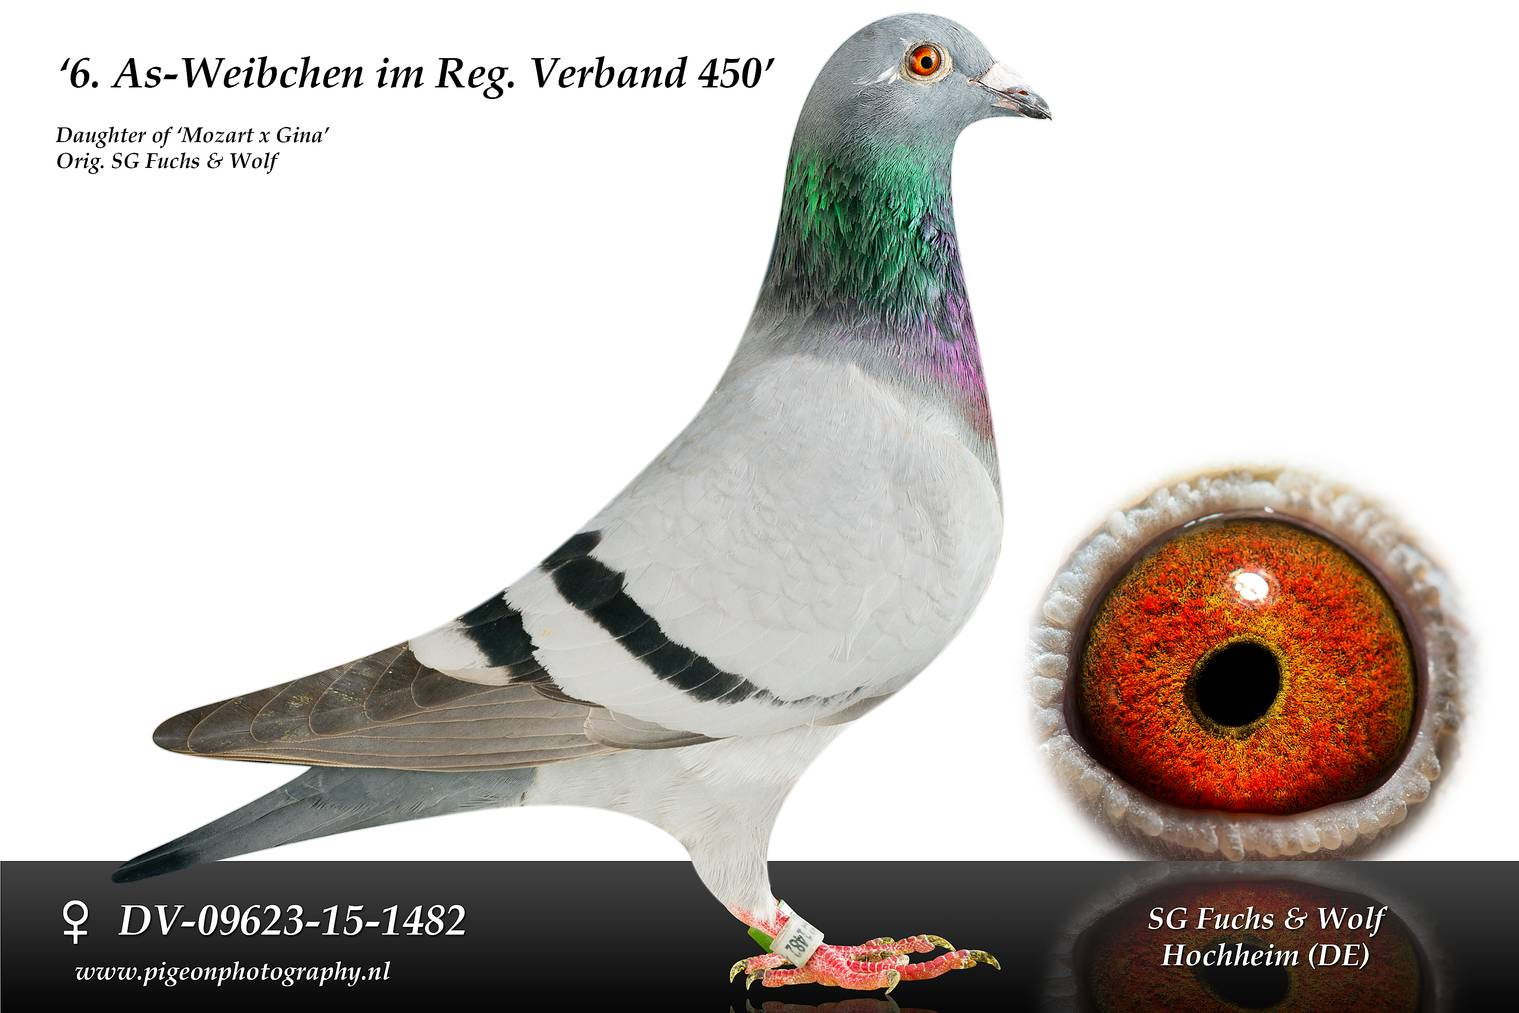 DV 09623 15 1482